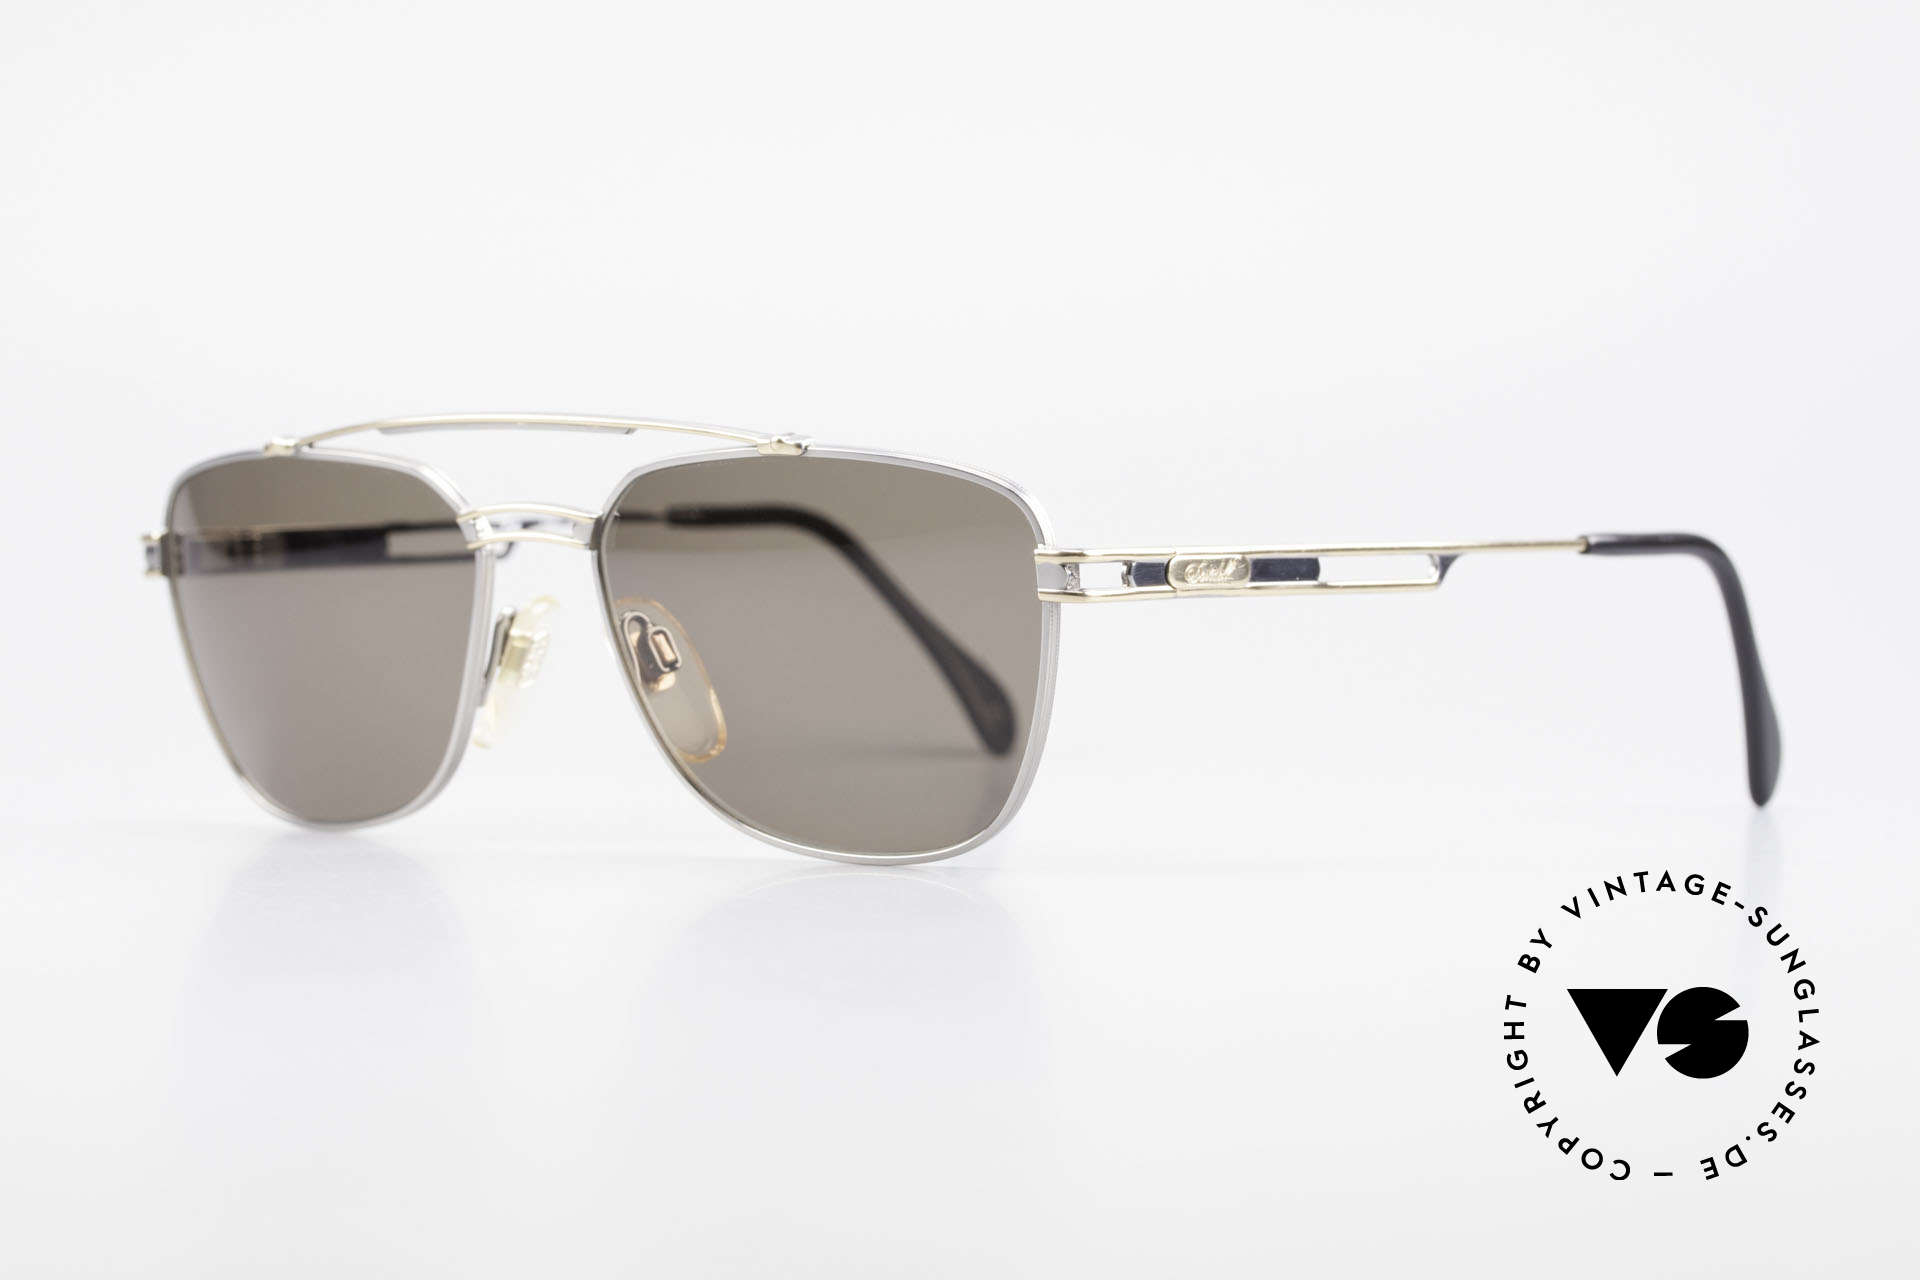 Davidoff 708 Classic Men's Sunglasses, very interesting frame finish (titanium / gold metallic), Made for Men